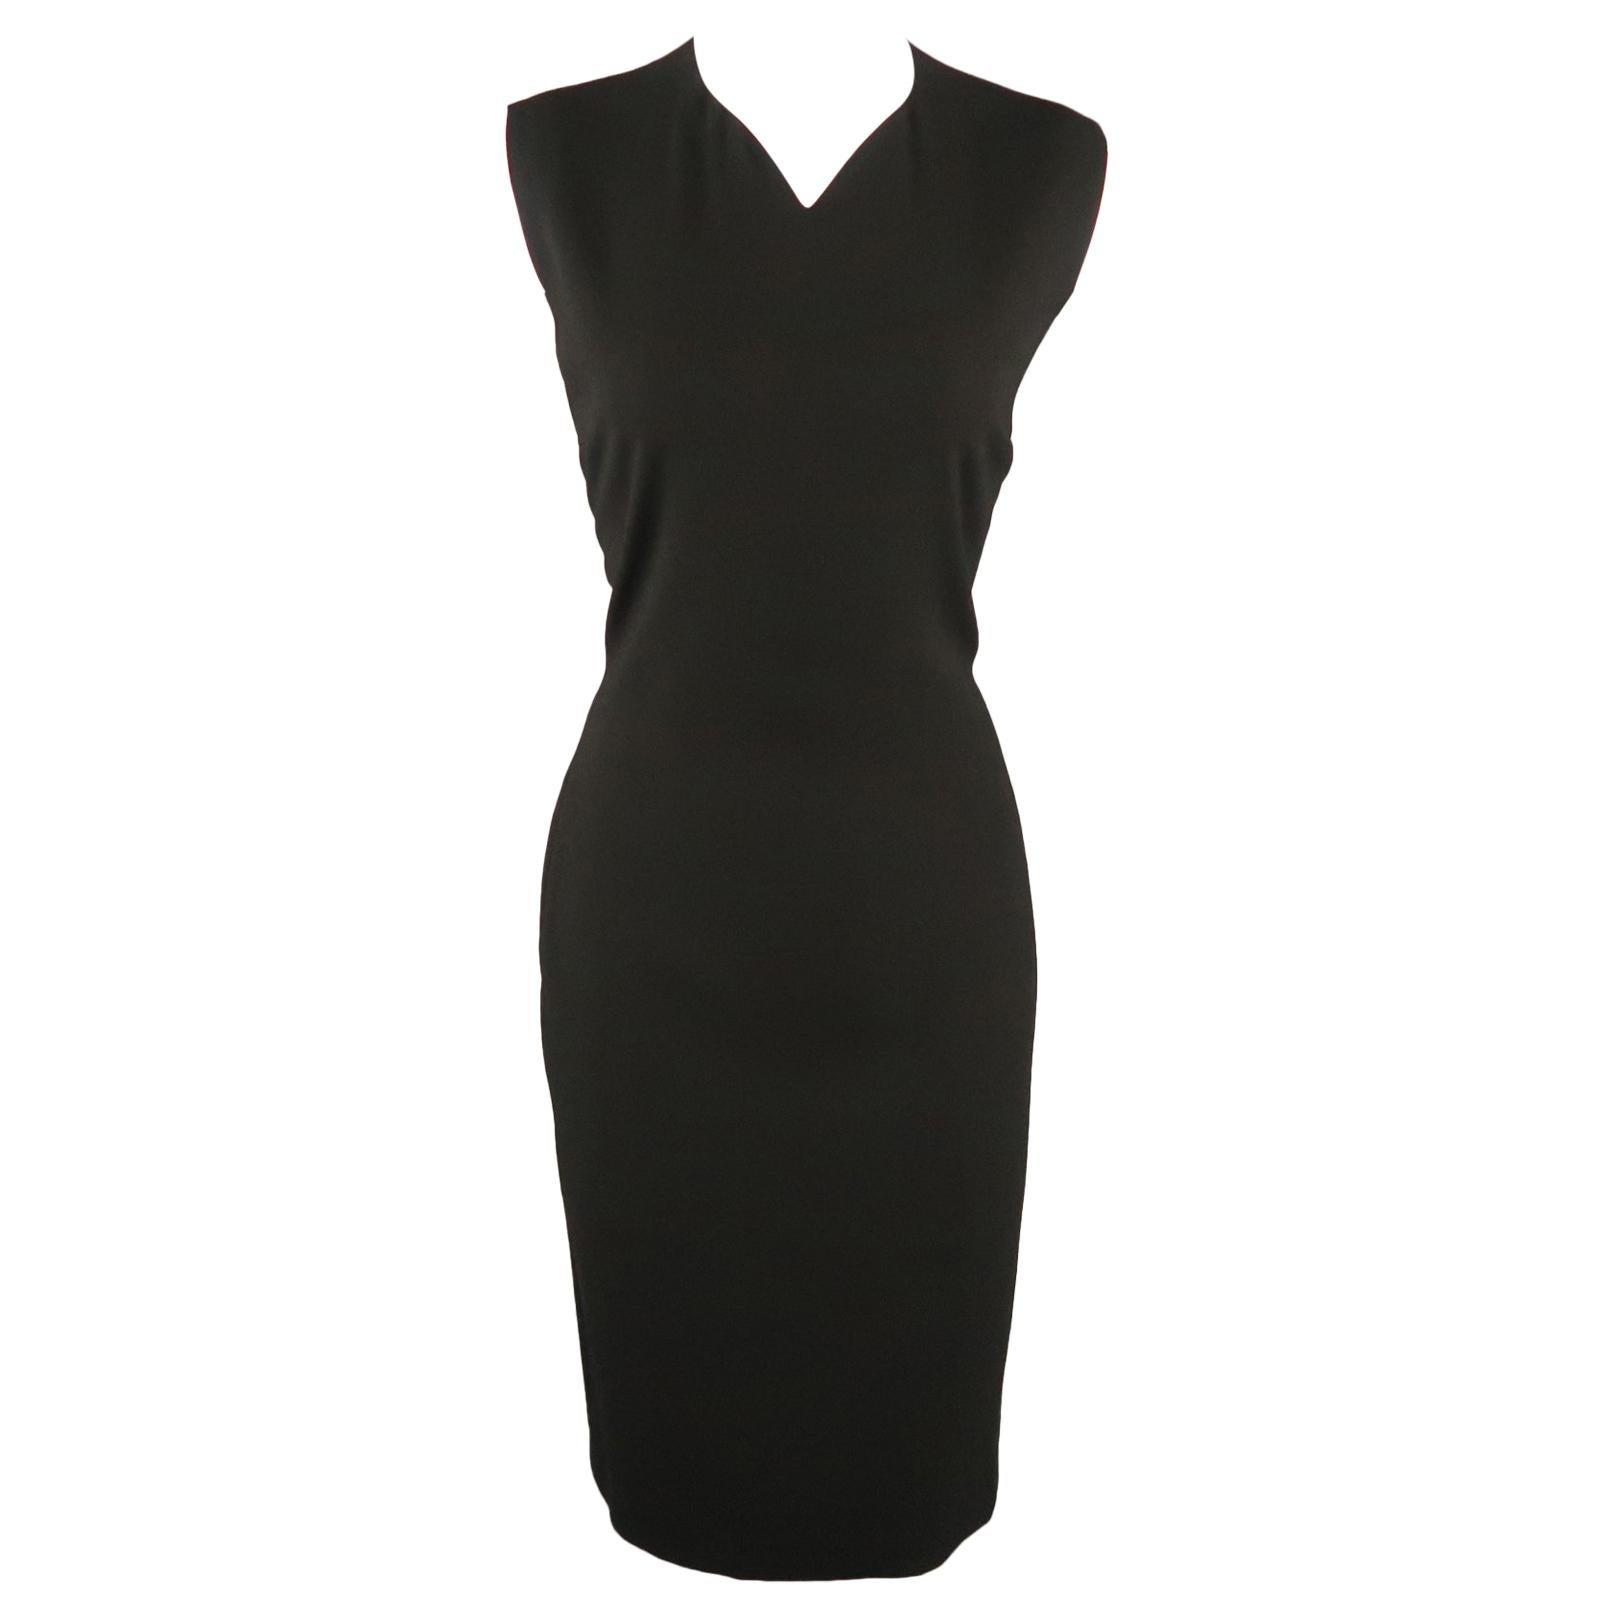 PRADA Size M Black Draped Chiffon Silk Sleeveless Cocktail Dress